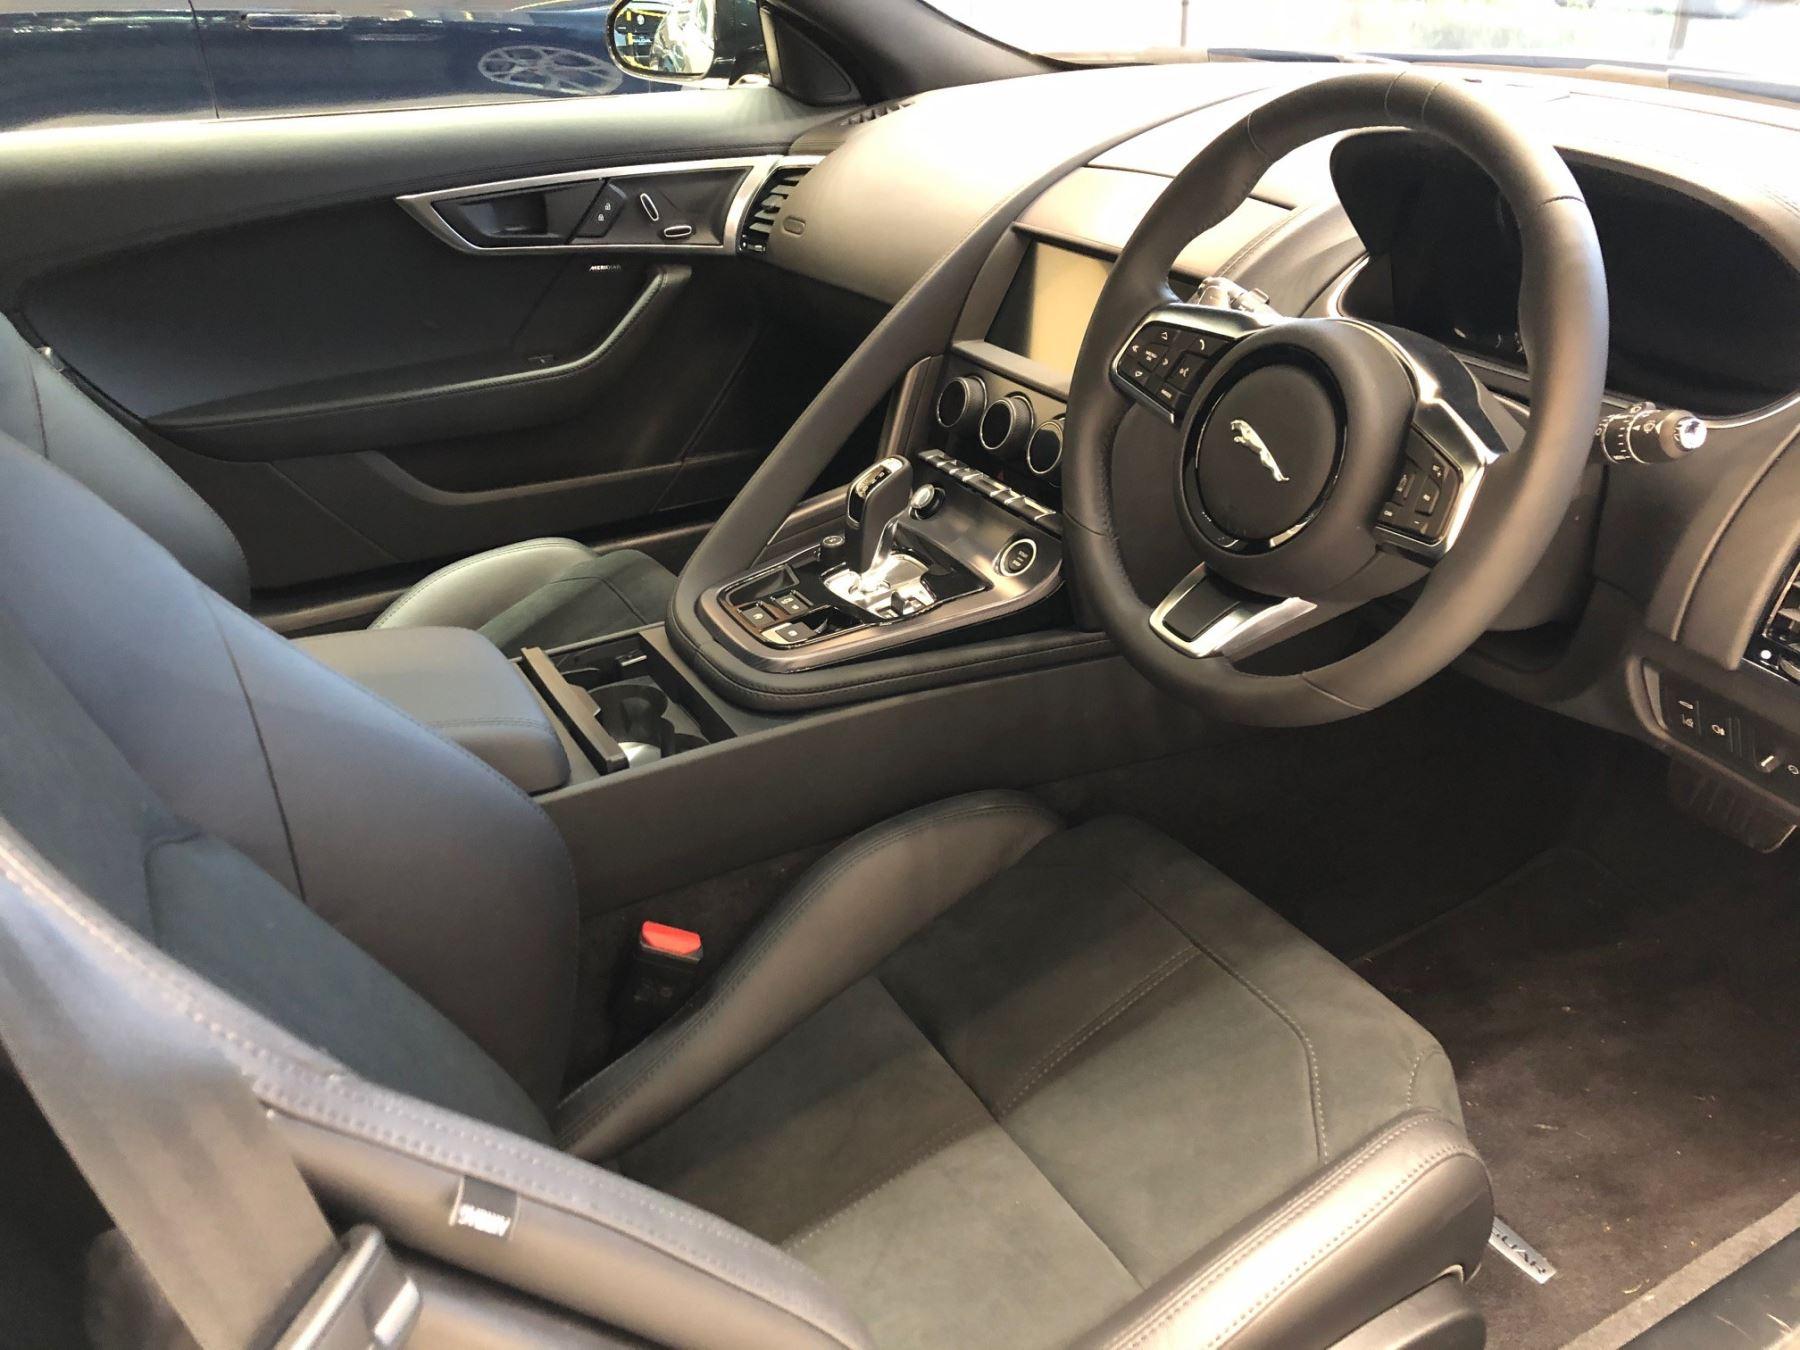 Jaguar F-TYPE Coupe Coupe 2.0 P300 RWD R-Dynamic image 4